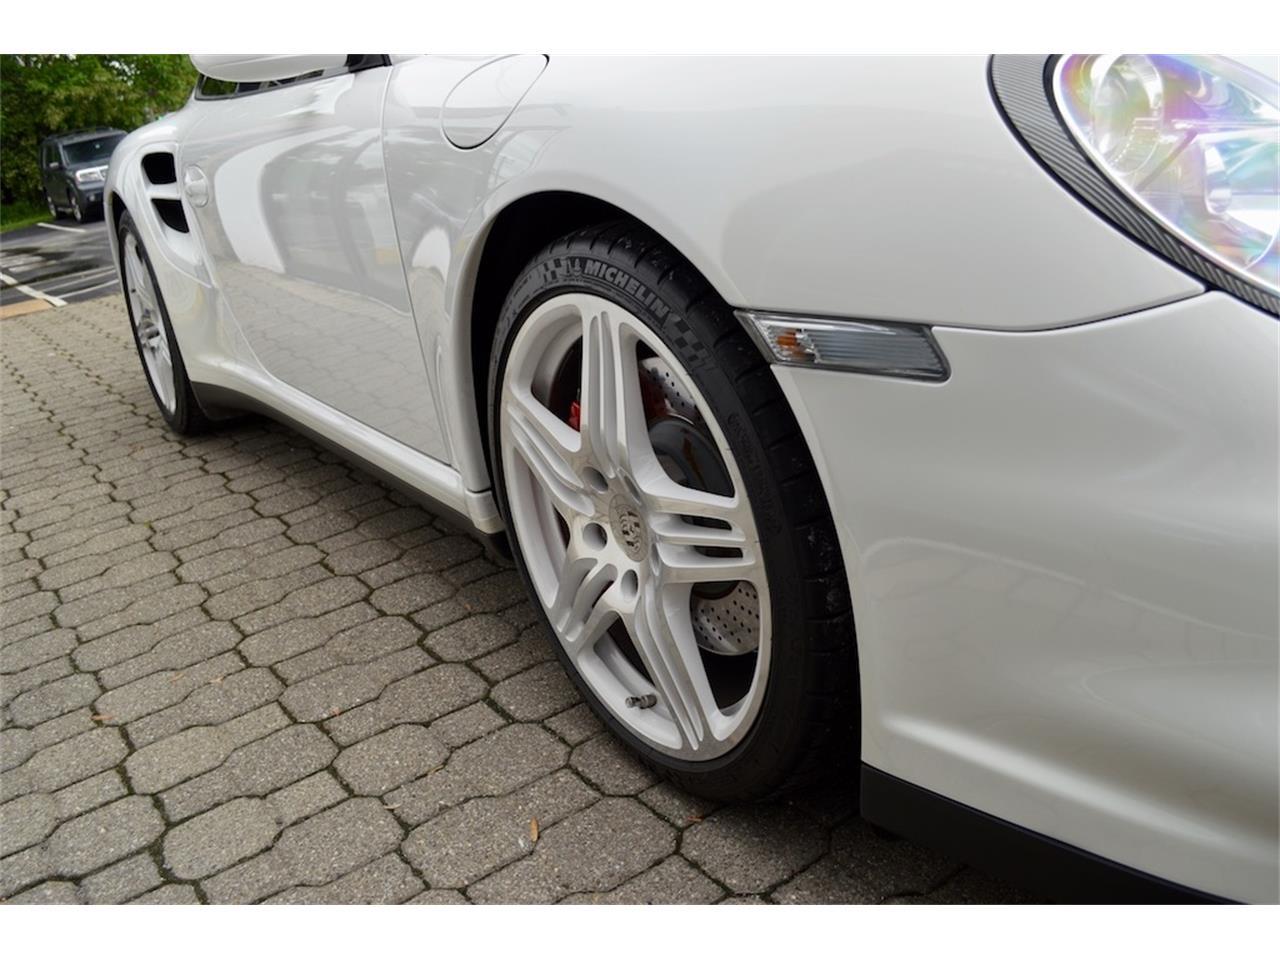 2007 Porsche 911 Turbo (CC-1351922) for sale in West Chester, Pennsylvania